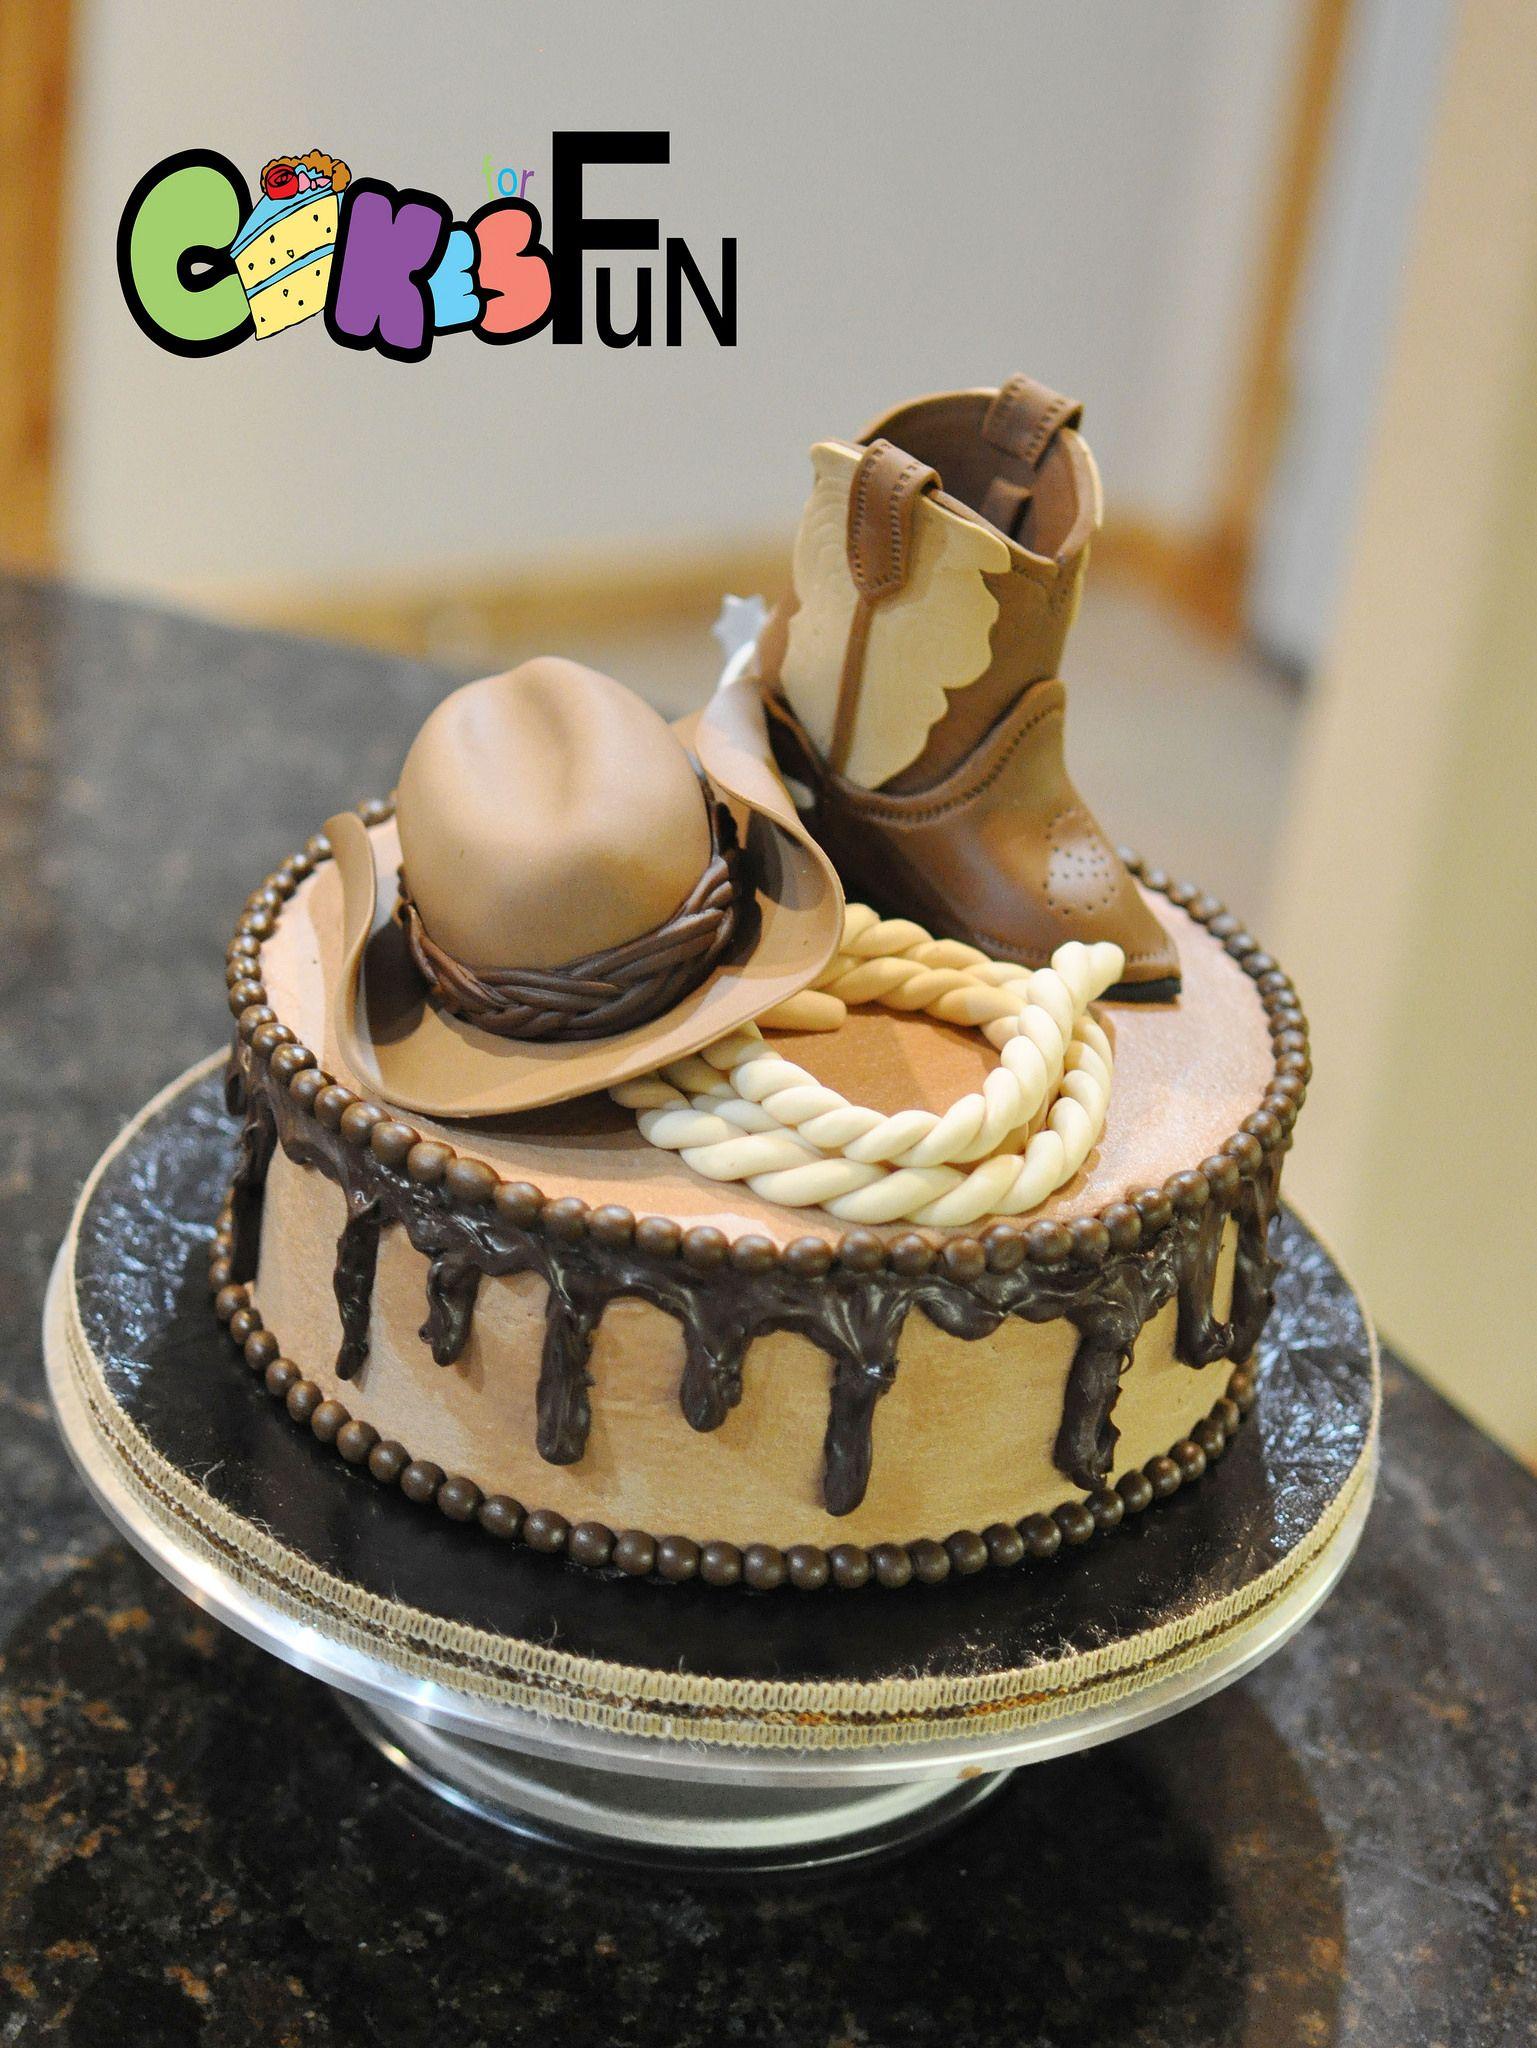 50 Ideas De Queques Pastel De Tortilla Tortas Tartas 7 pajitas de papel arcoíris para decoración de dulces y pasteles, para cumpleaños, bodas, fiestas de celebración: 50 ideas de queques pastel de